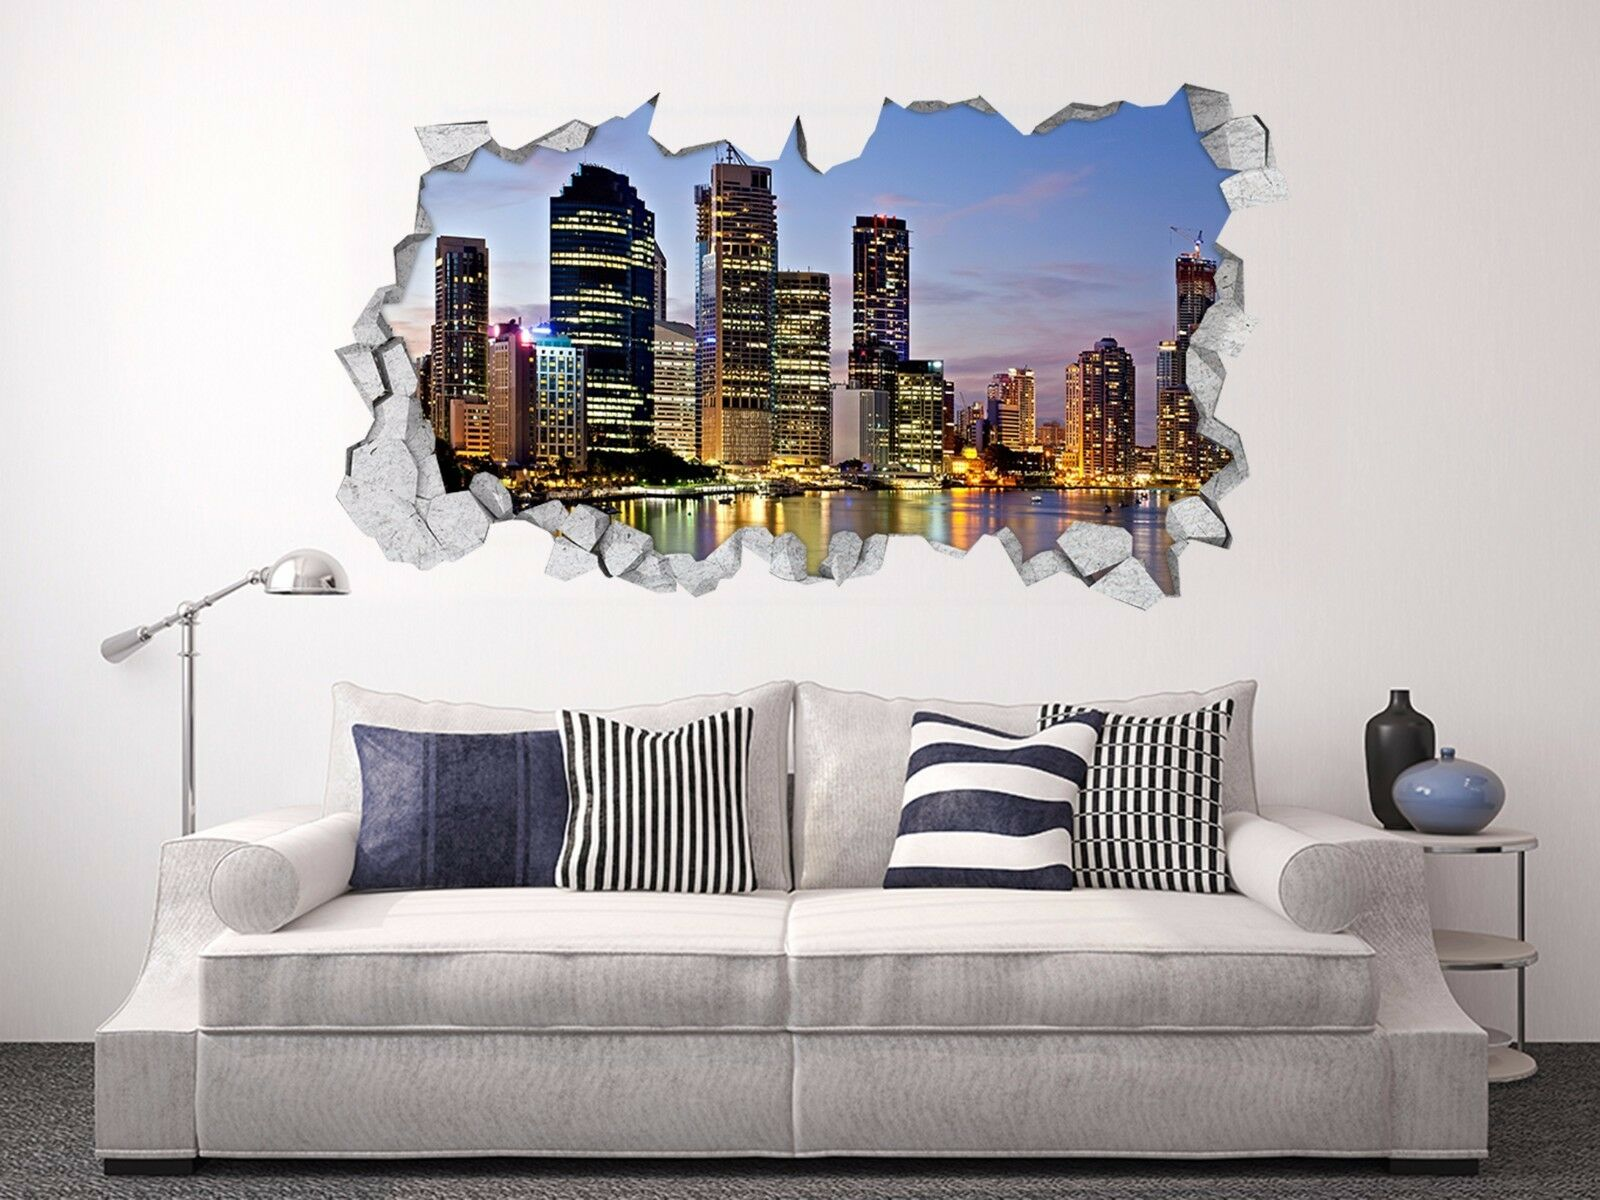 3D Città Splendente 143 Parete Murales Adesivi Decal Sfondamento AJ WALLPAPER IT